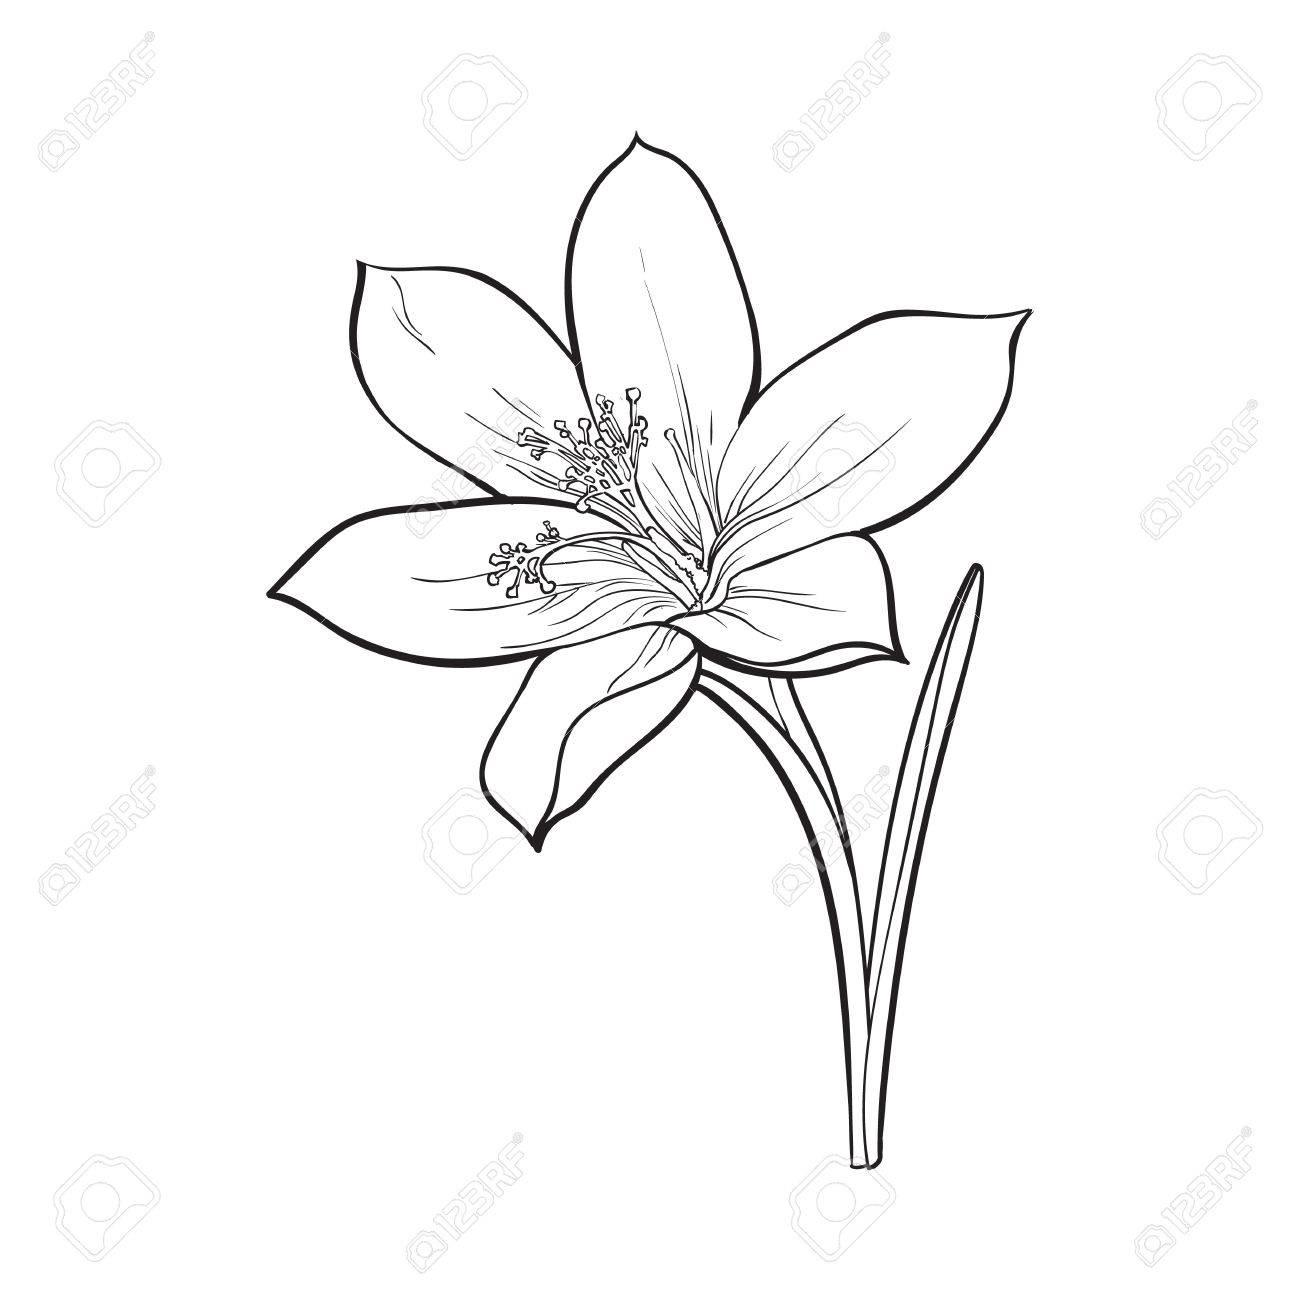 1300x1300 Delicate Single Crocus Spring Flower With Stem And Leaf, Sketch